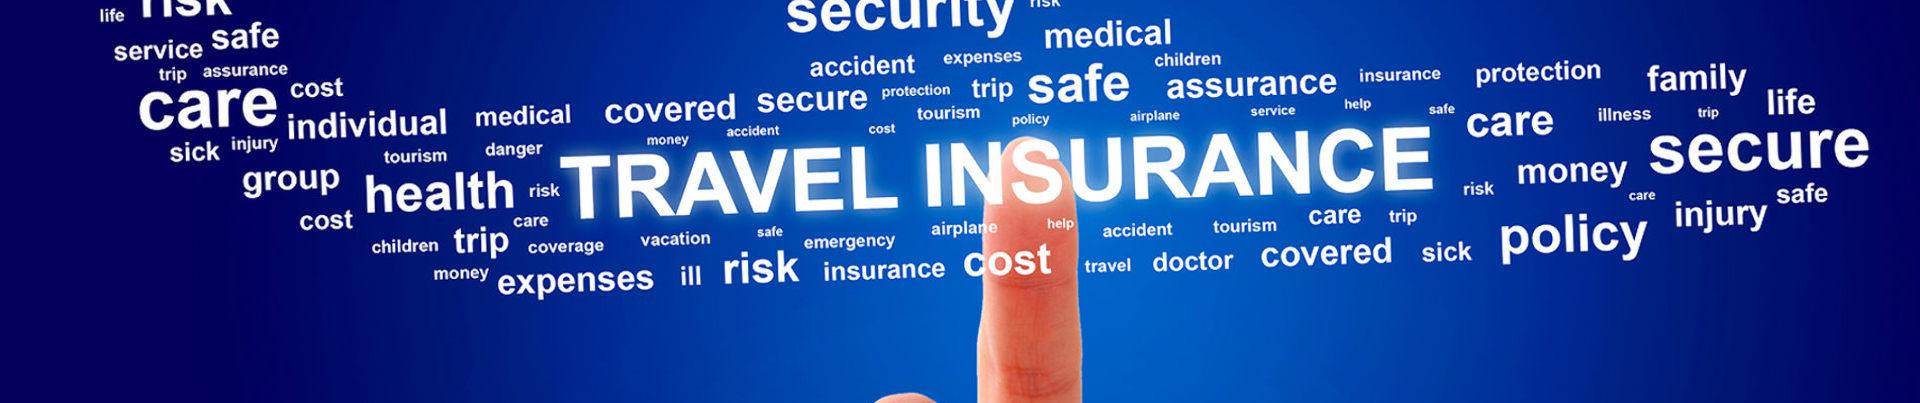 tavel-insurance